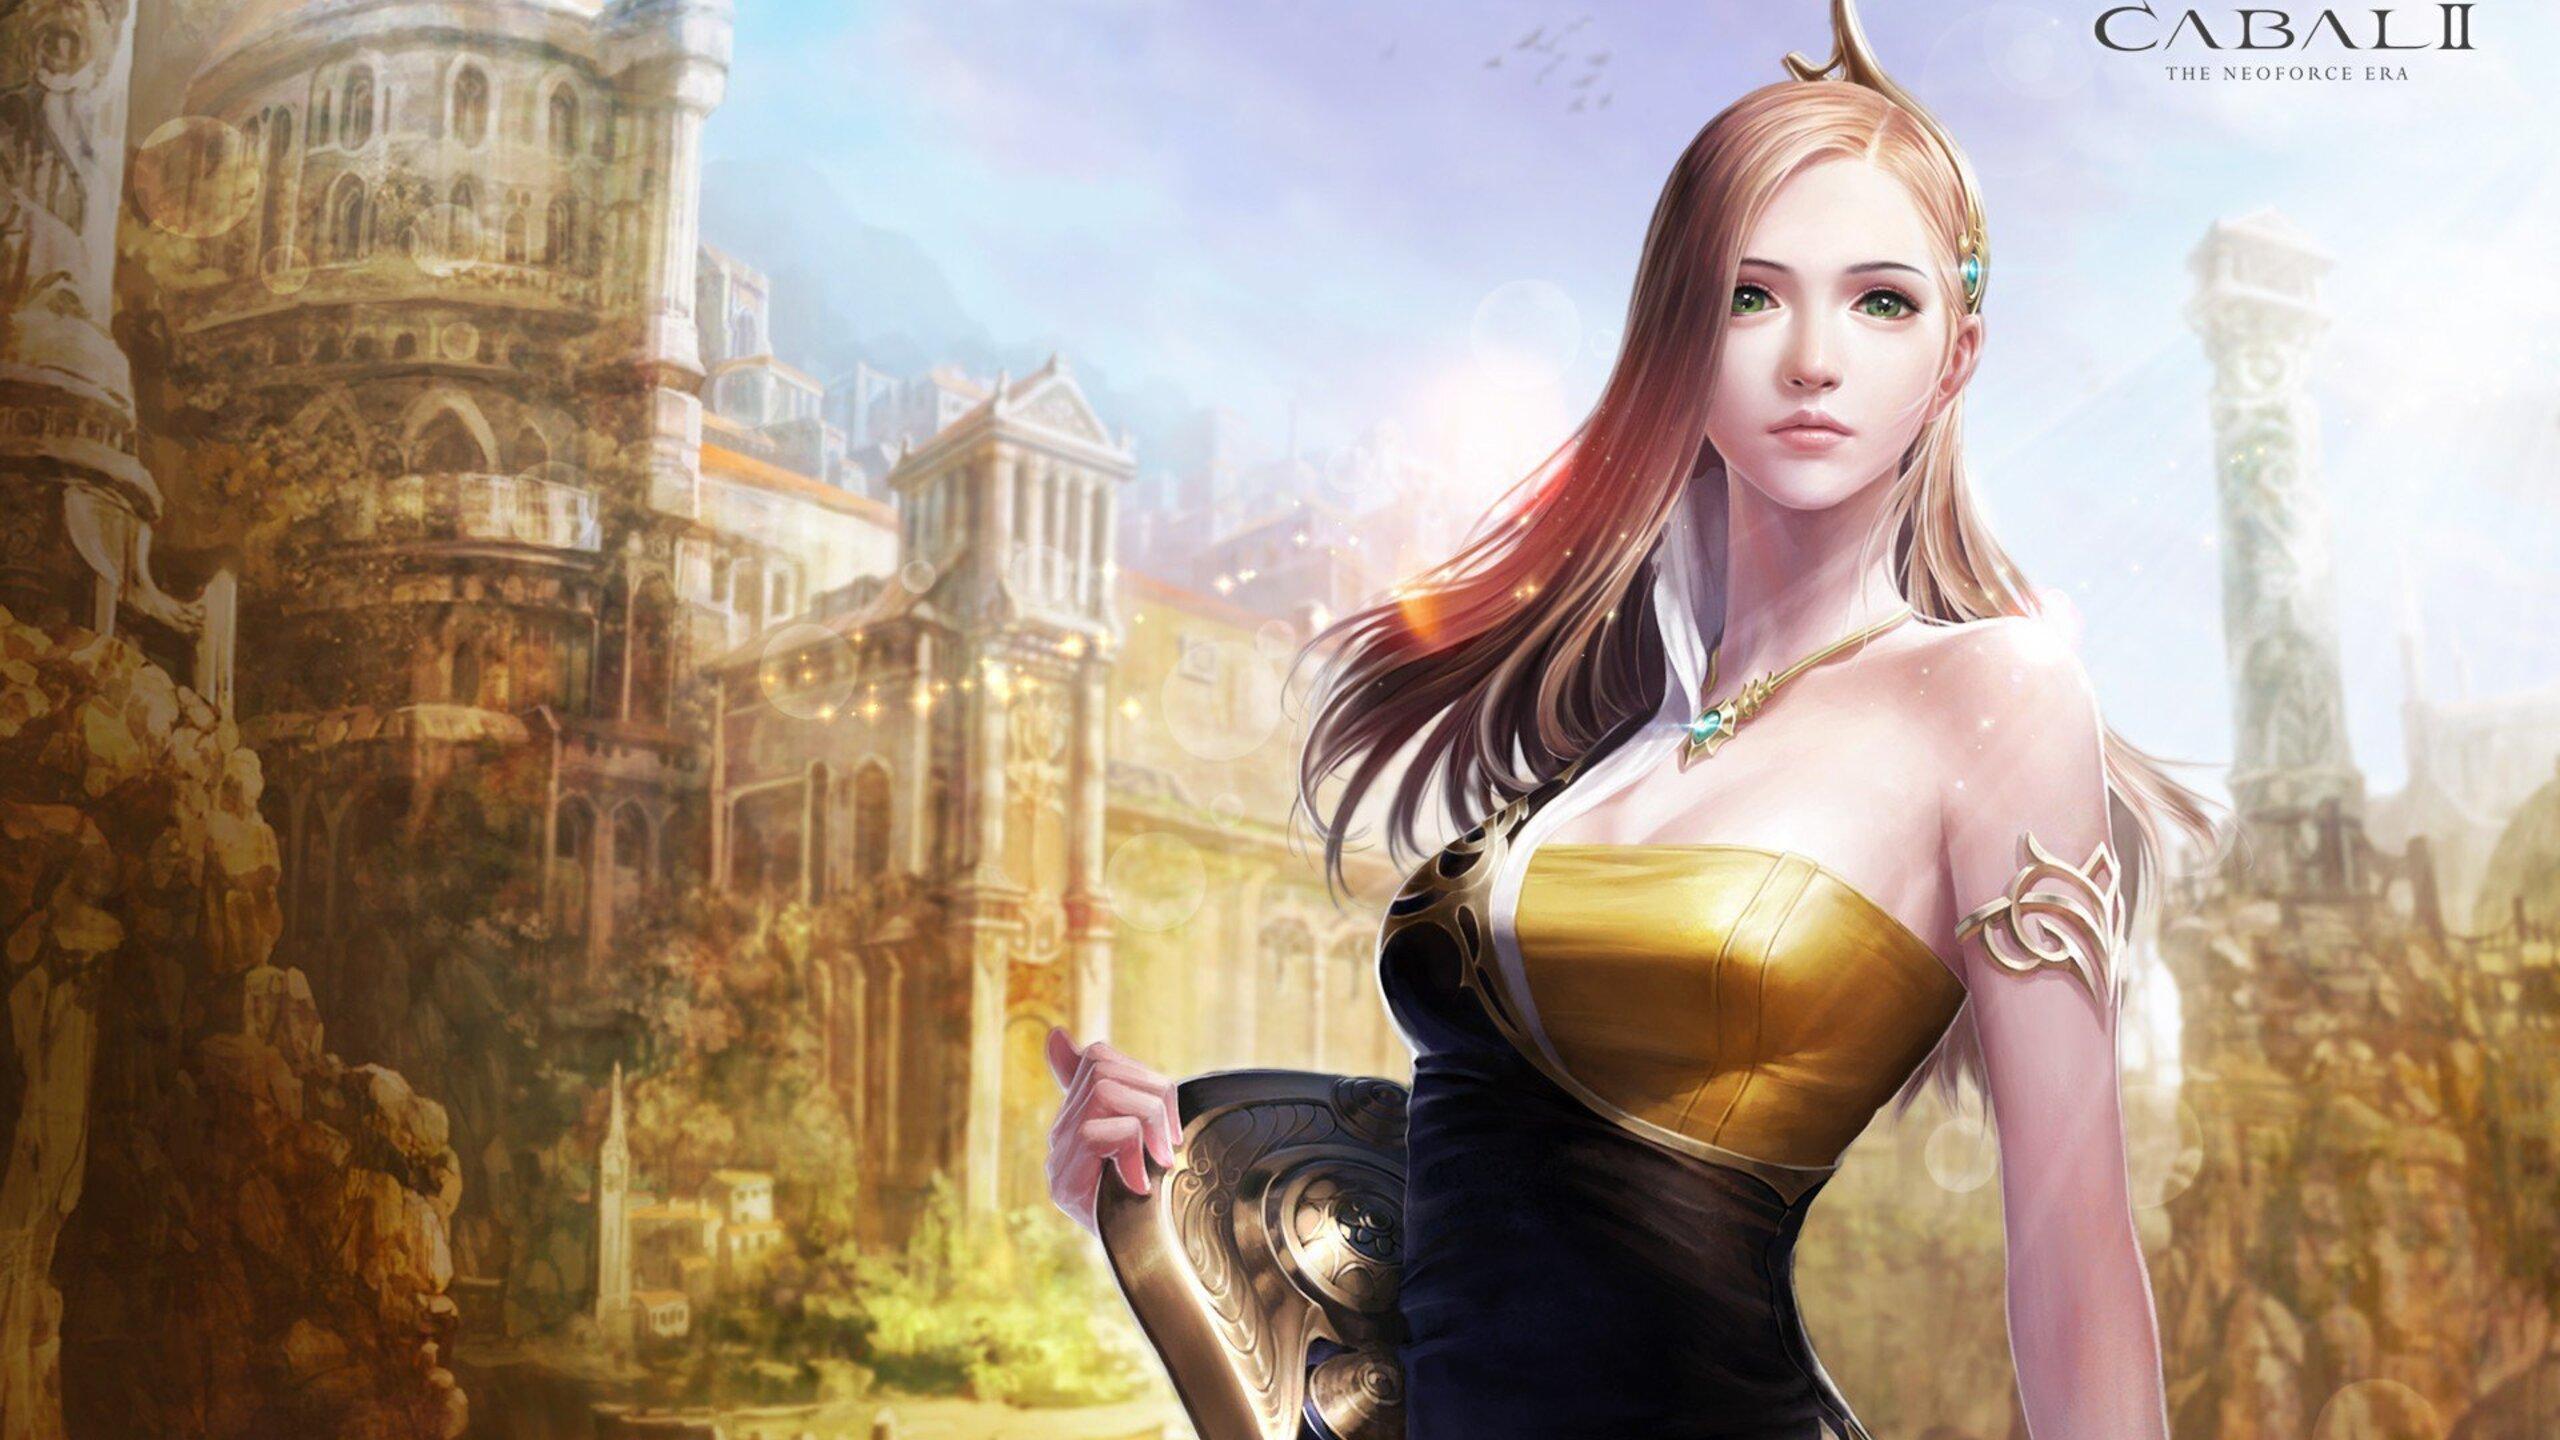 2560x1440 Beautiful Game Girl 1440P Resolution HD 4k ...